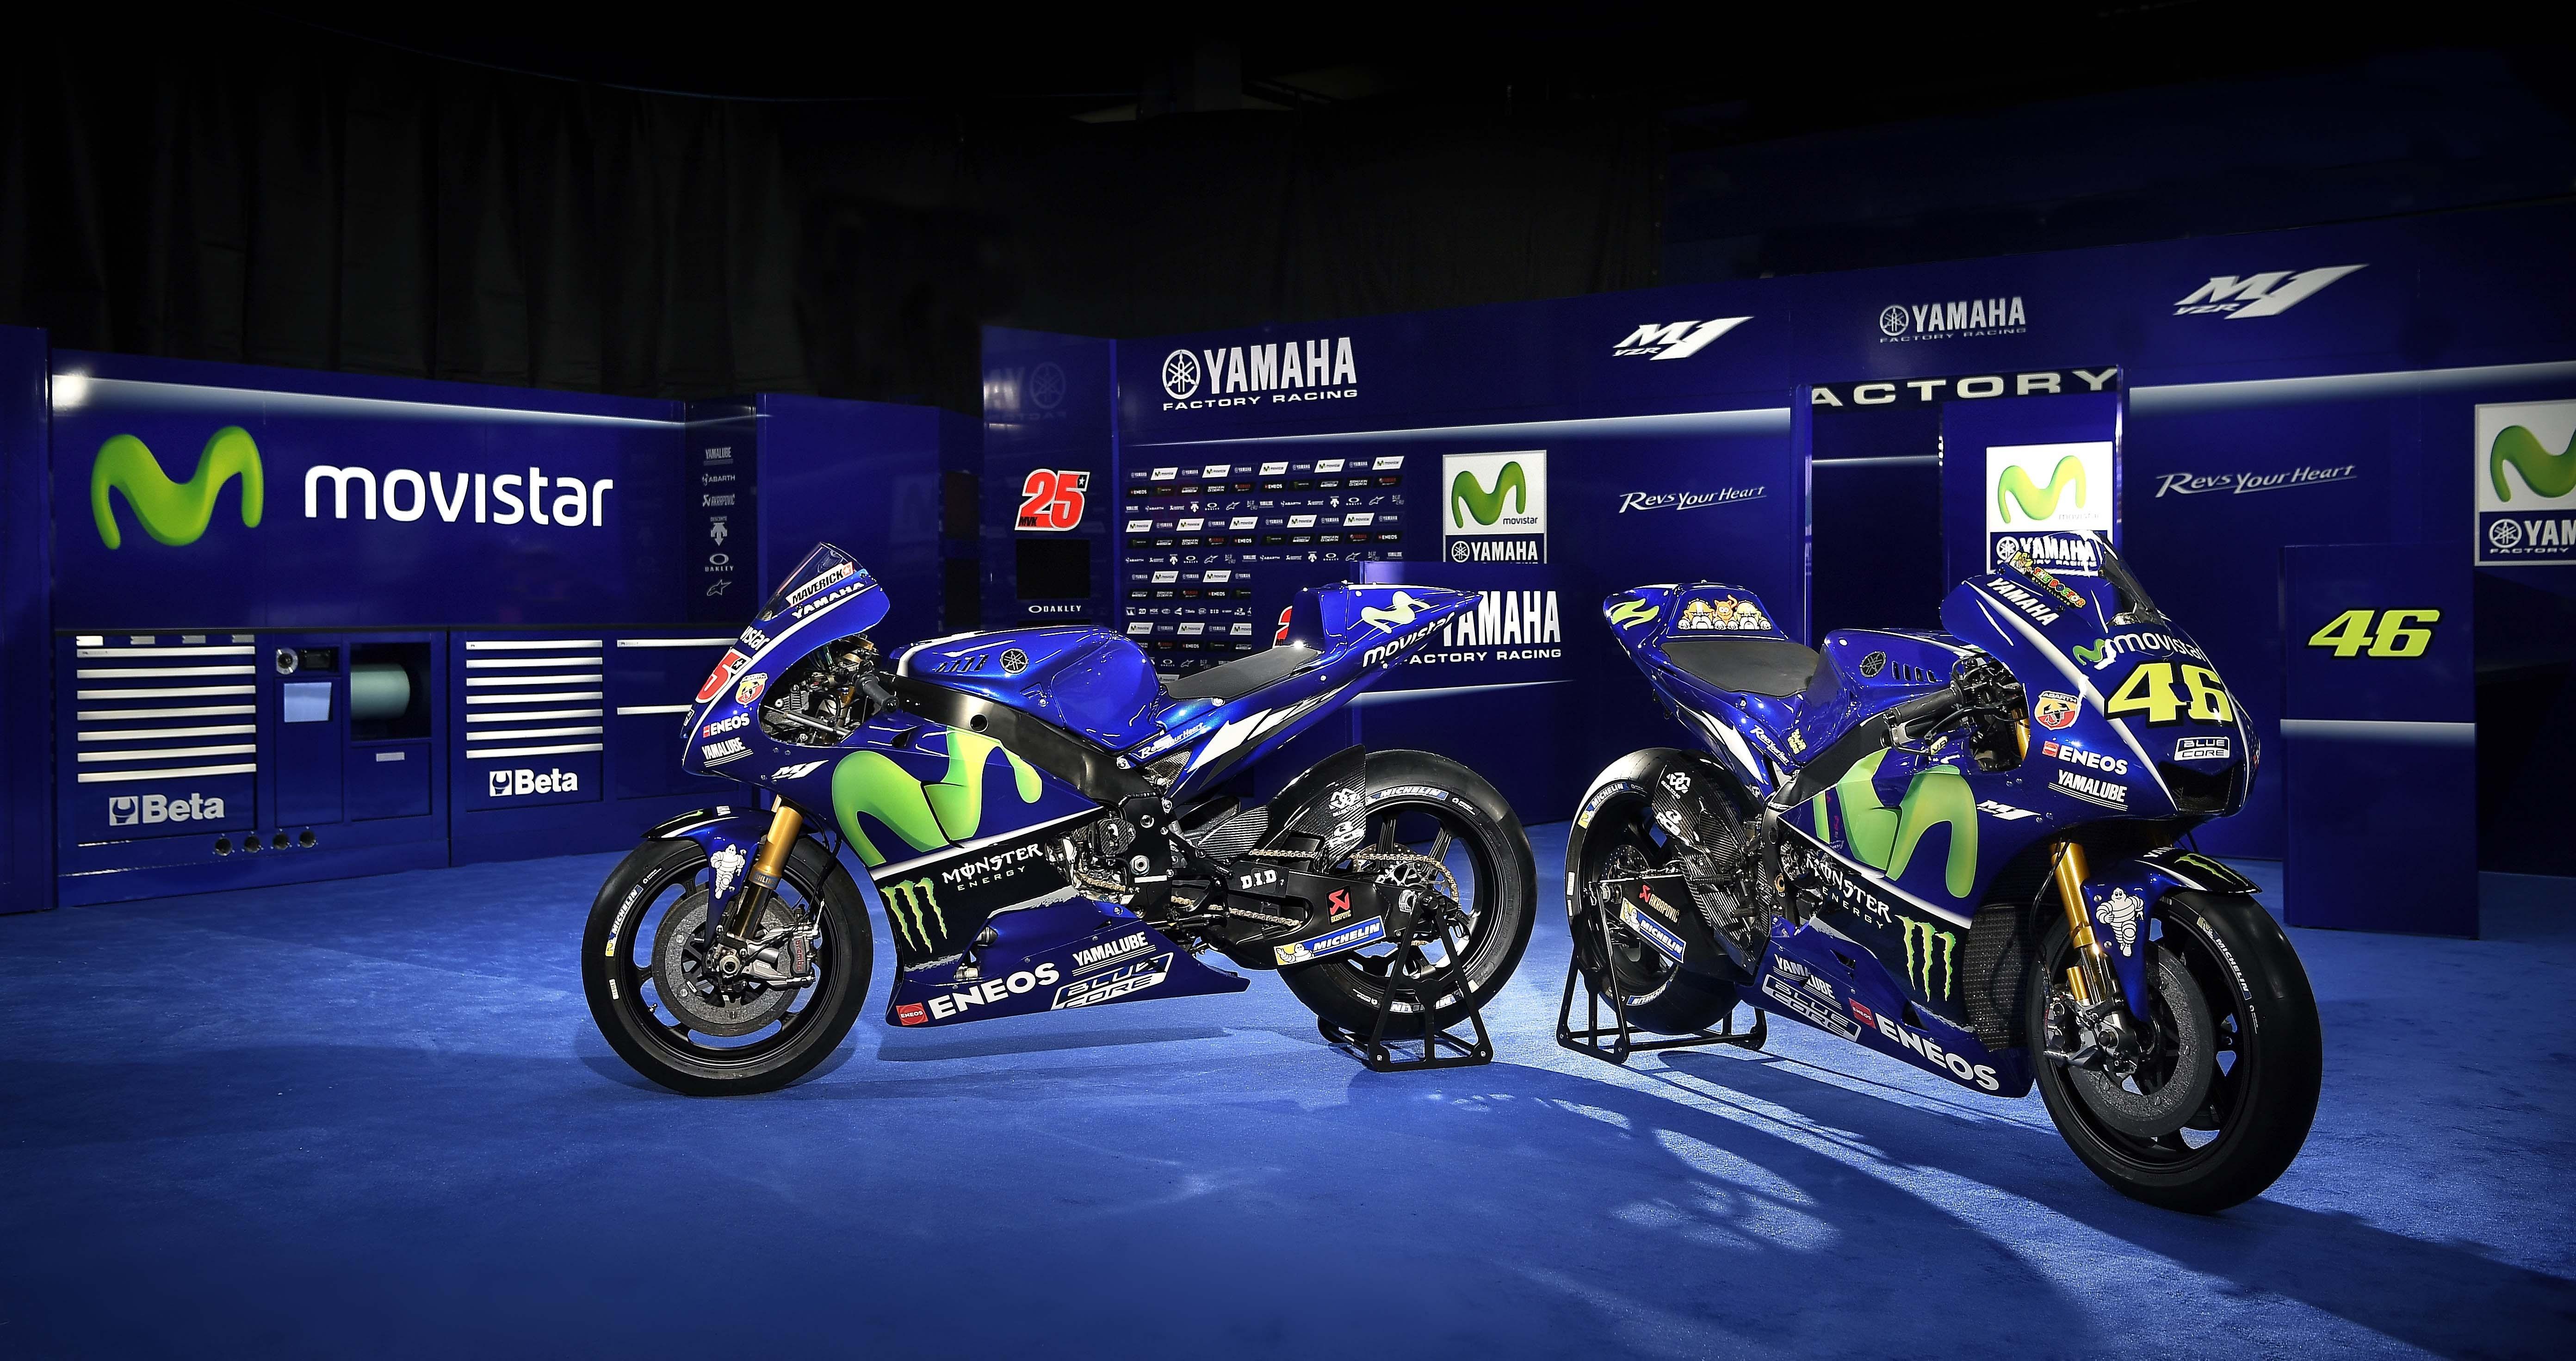 2017-Movistar-Yamaha-MotoGP-Team-Launch-Yamaha-YZR-M1-21.jpg